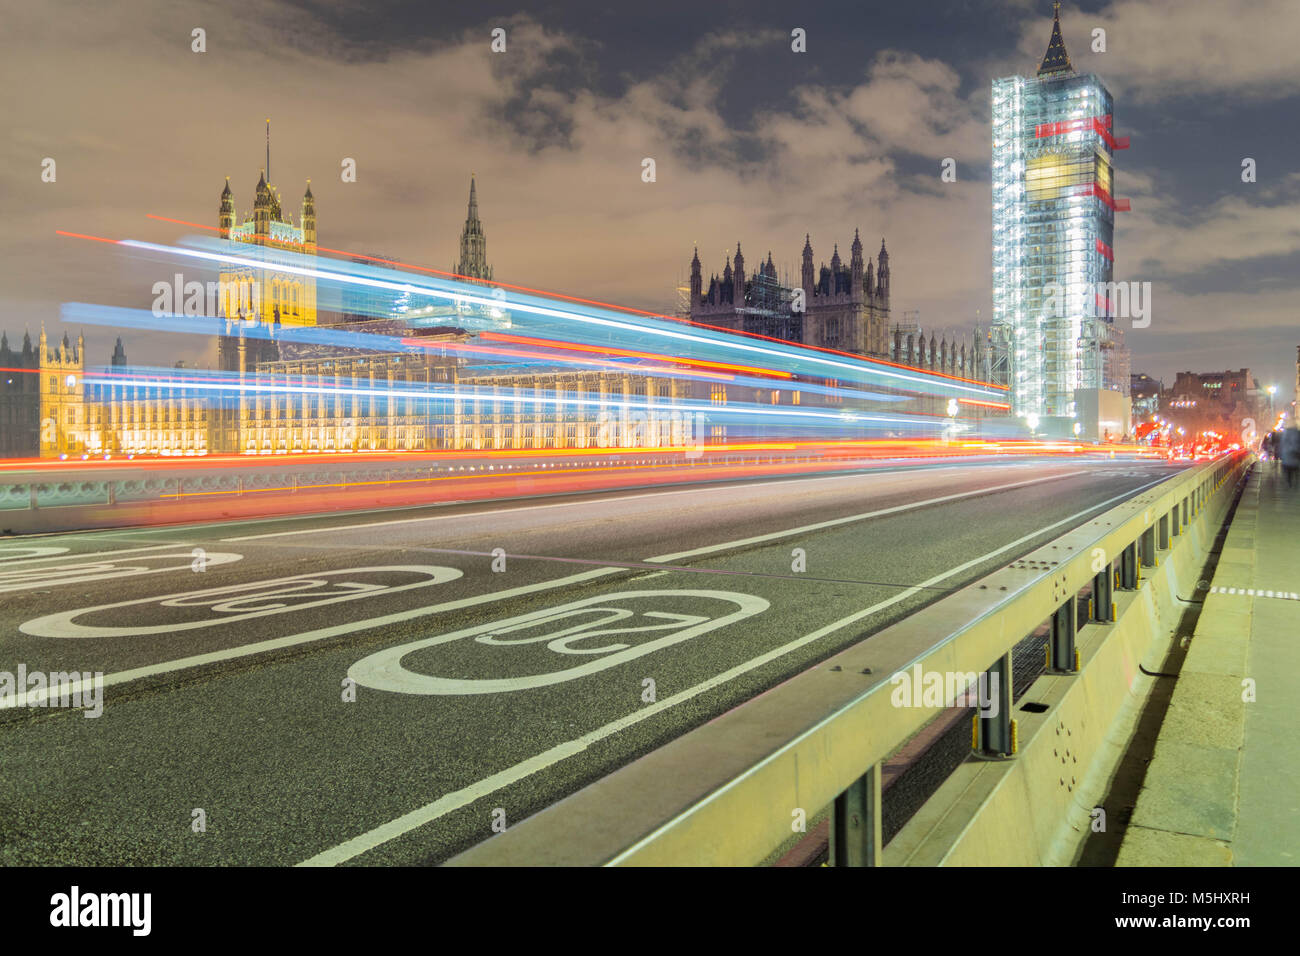 London, United Kingdom, February 17, 2018: long exposure shot of Westminster bridge and big ben renovation scaffolding Stock Photo